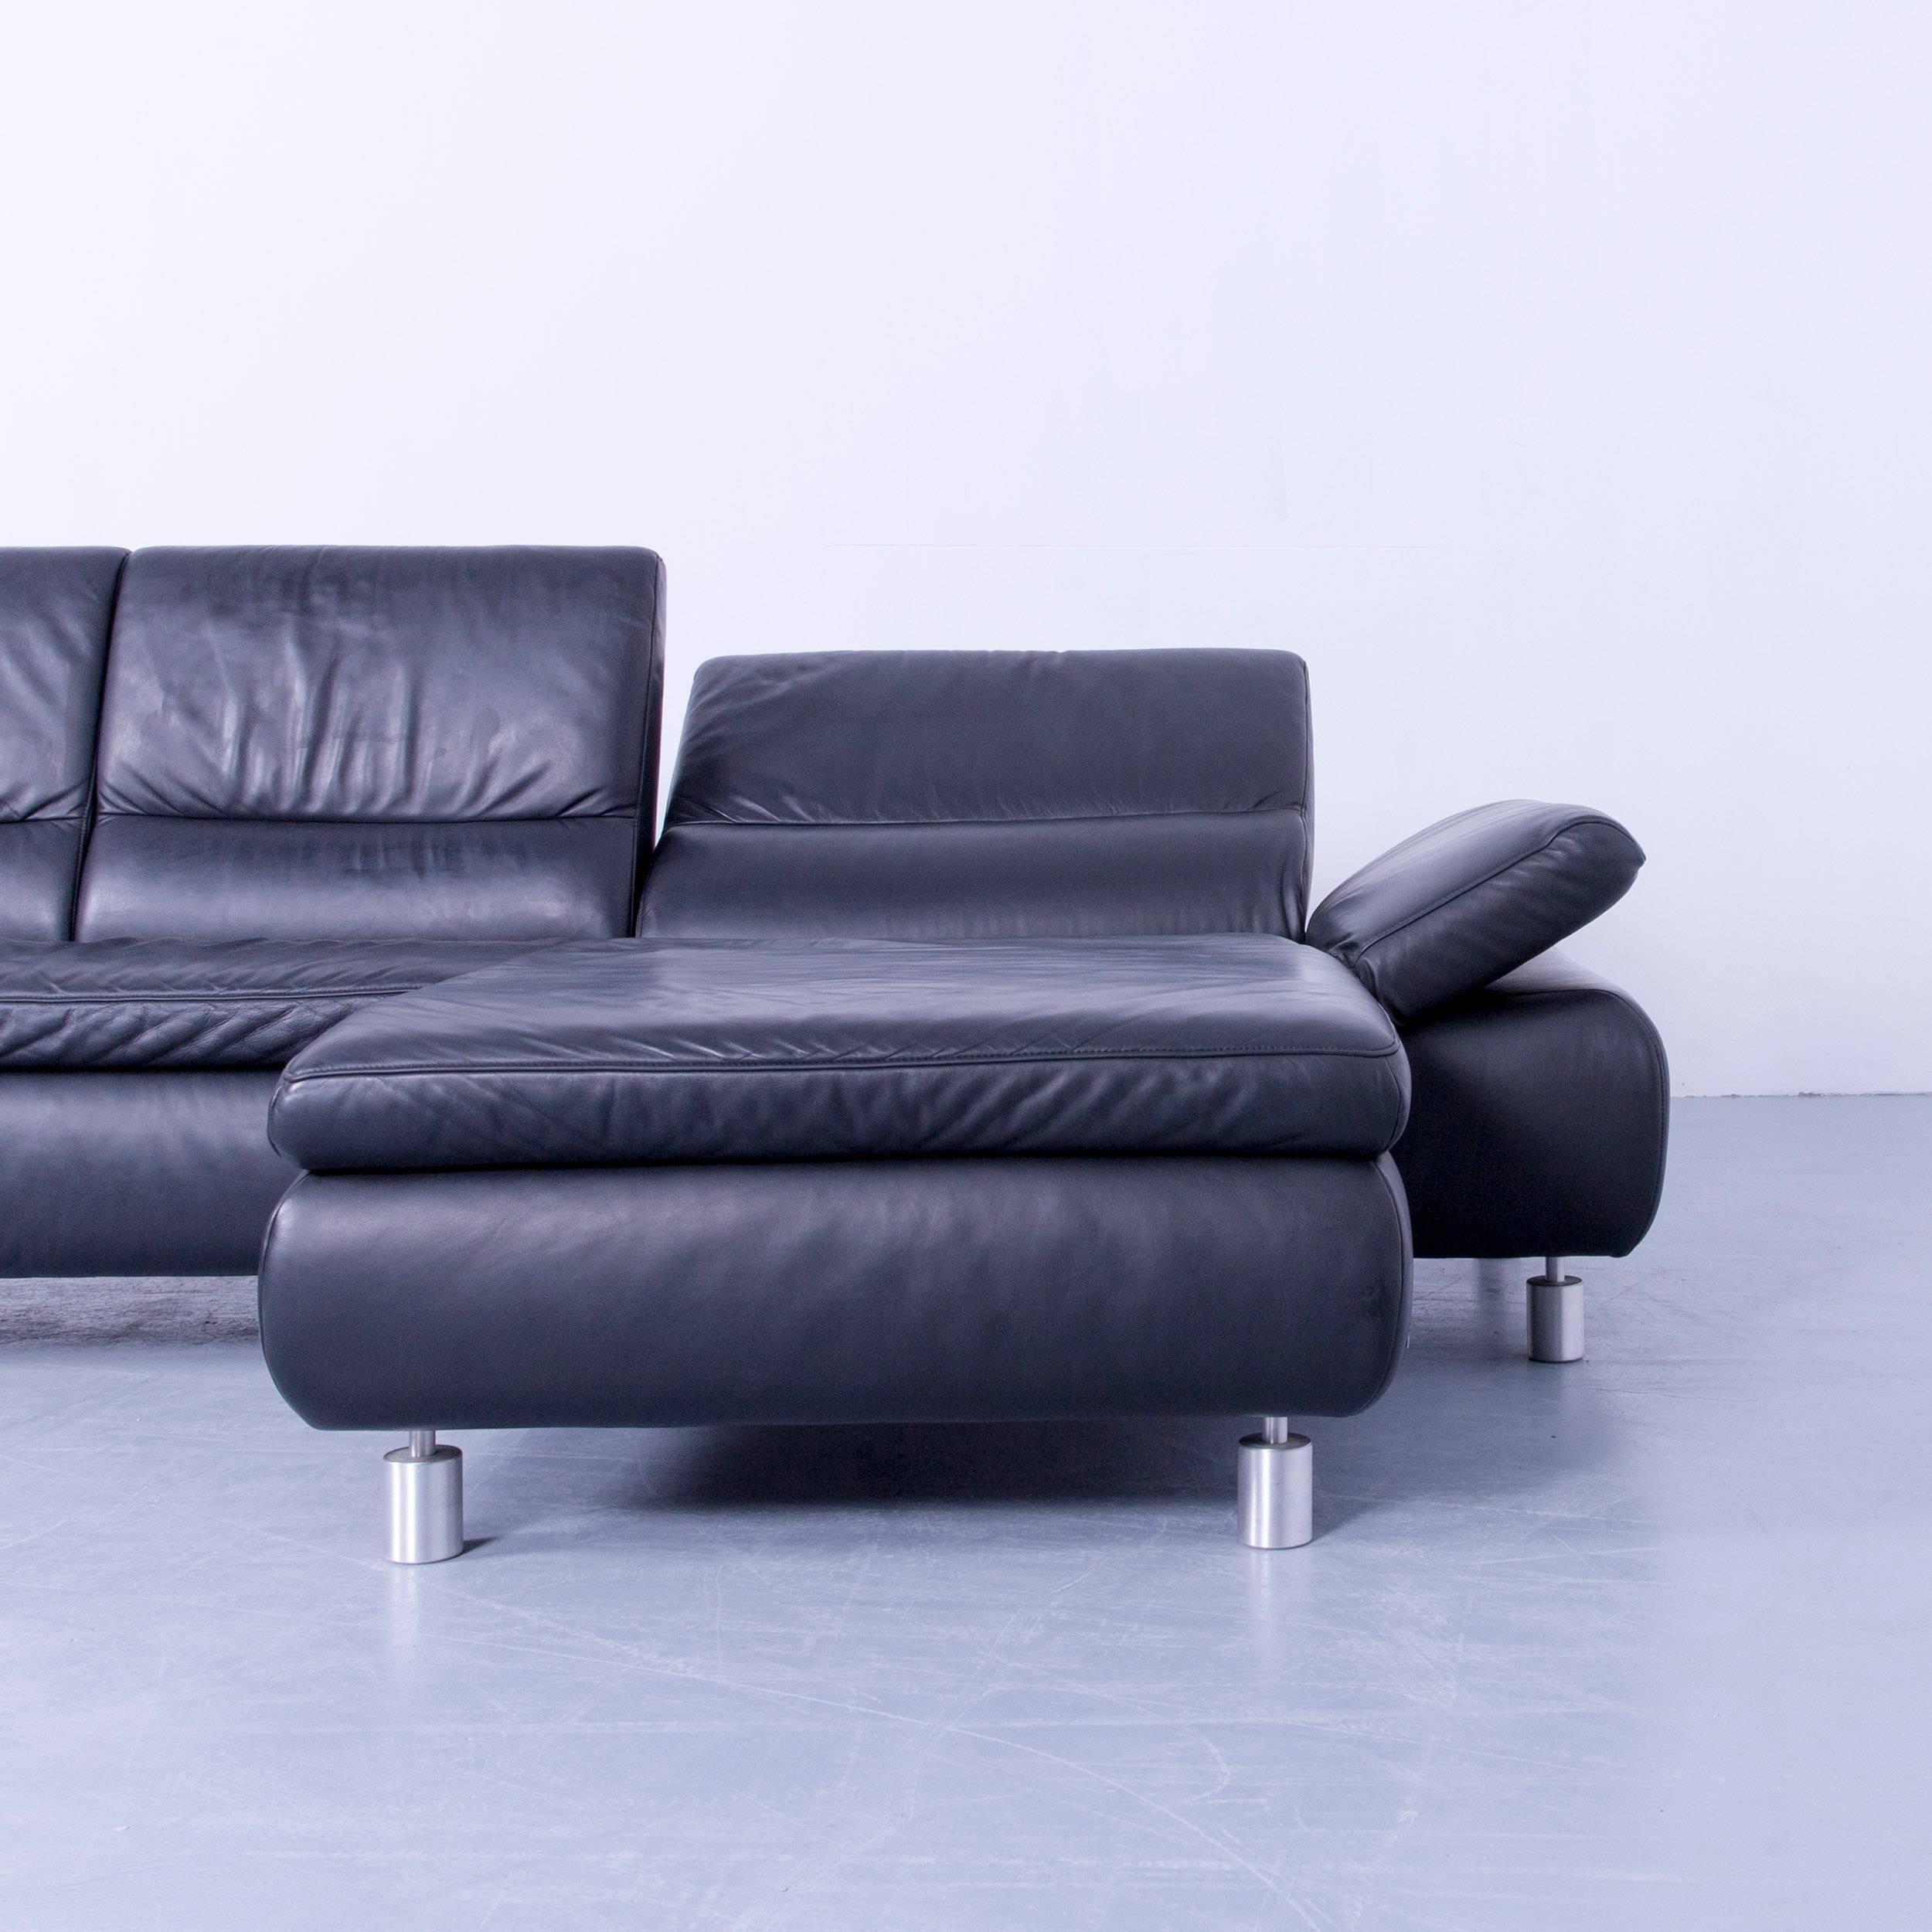 German Koinor Designer Corner Sofa Leather Black Couch Modern Function For  Sale